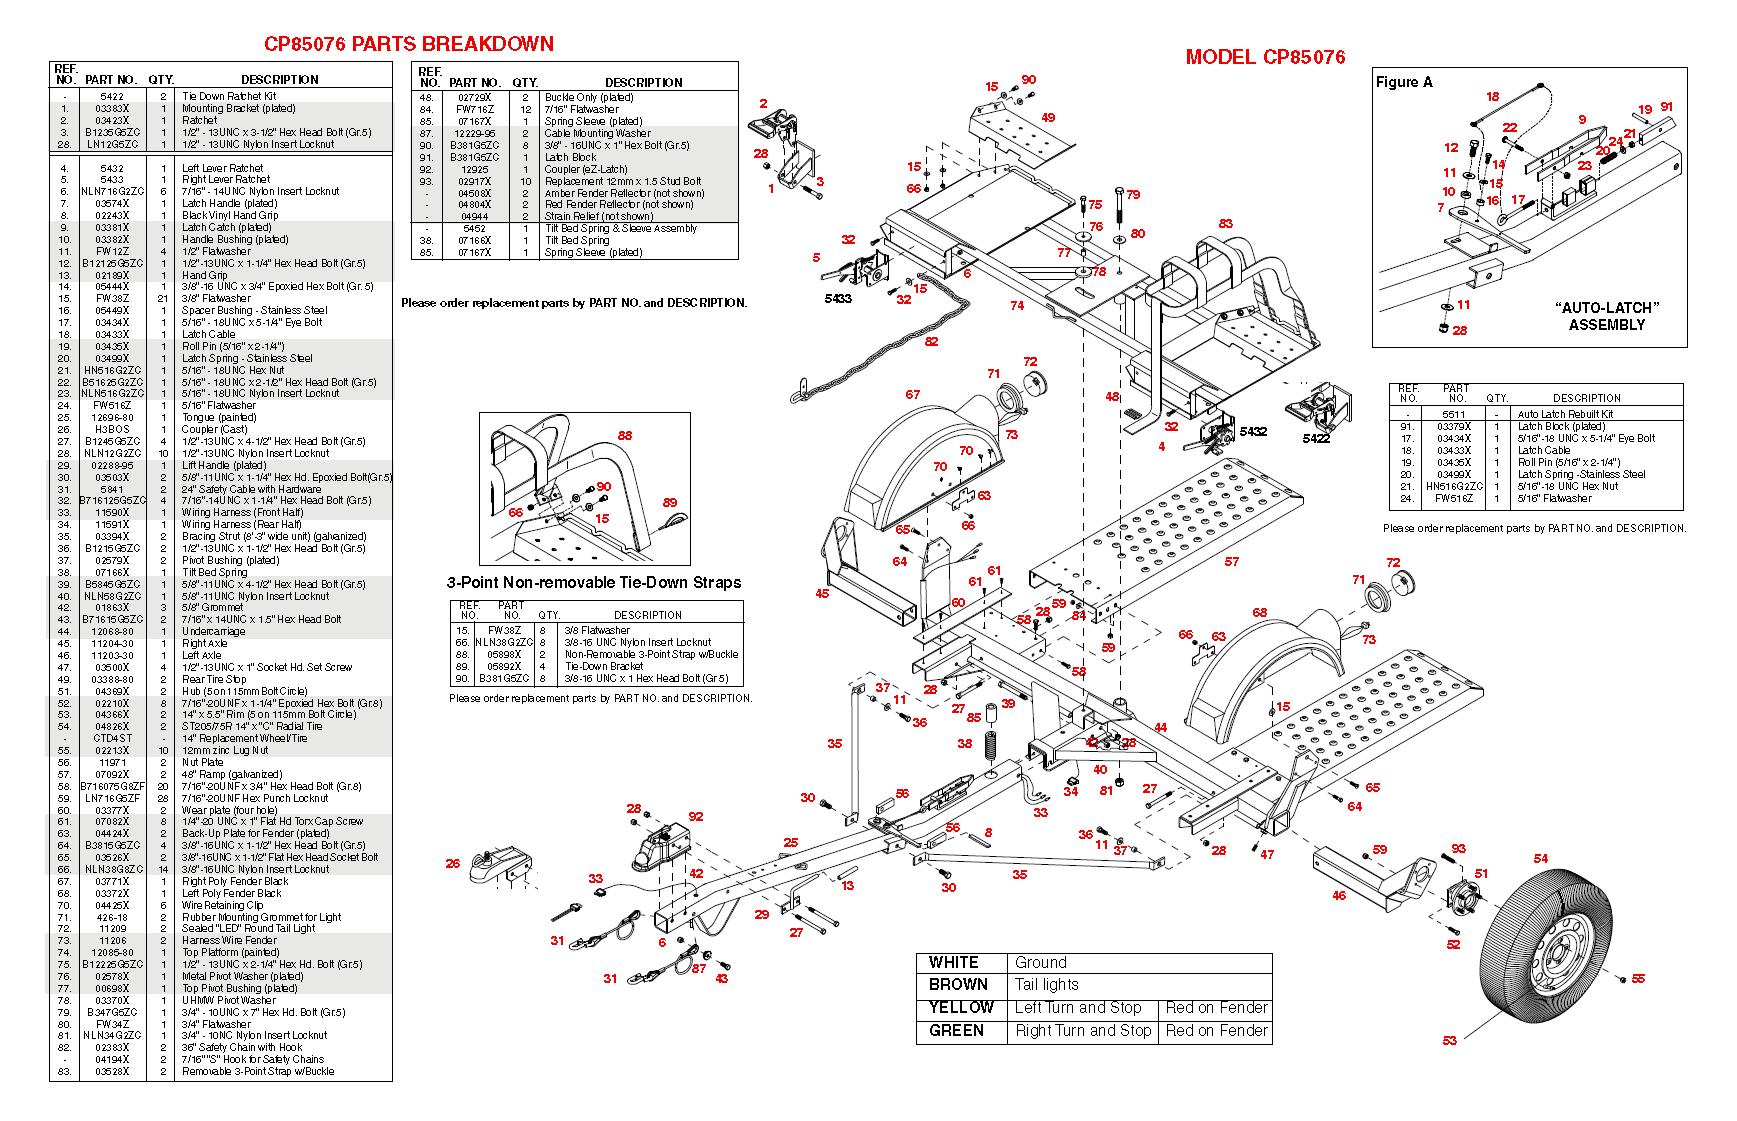 Car Dolly Wiring Diagram - Wiring Diagram Liry on trailer diagram, rv diagram, motorcycle diagram, horse diagram, boat diagram, jump start battery diagram, atv diagram, transportation diagram, tandem axle diagram, fifth wheel diagram,